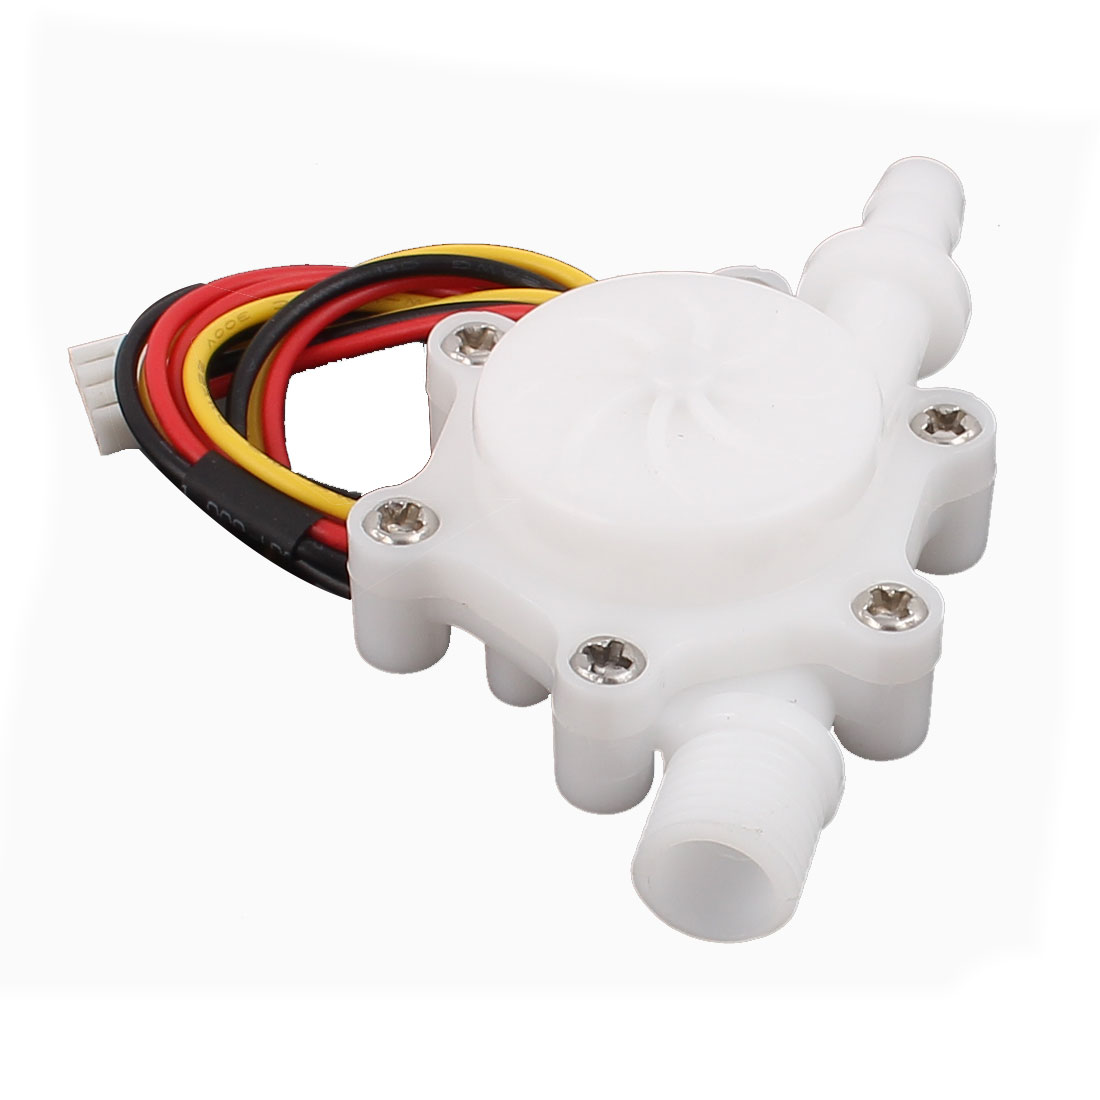 High Precision 0.15-1.5L/min G1/4 Thread 6mm OD Water Flow Sensor SEN-HZ06FB